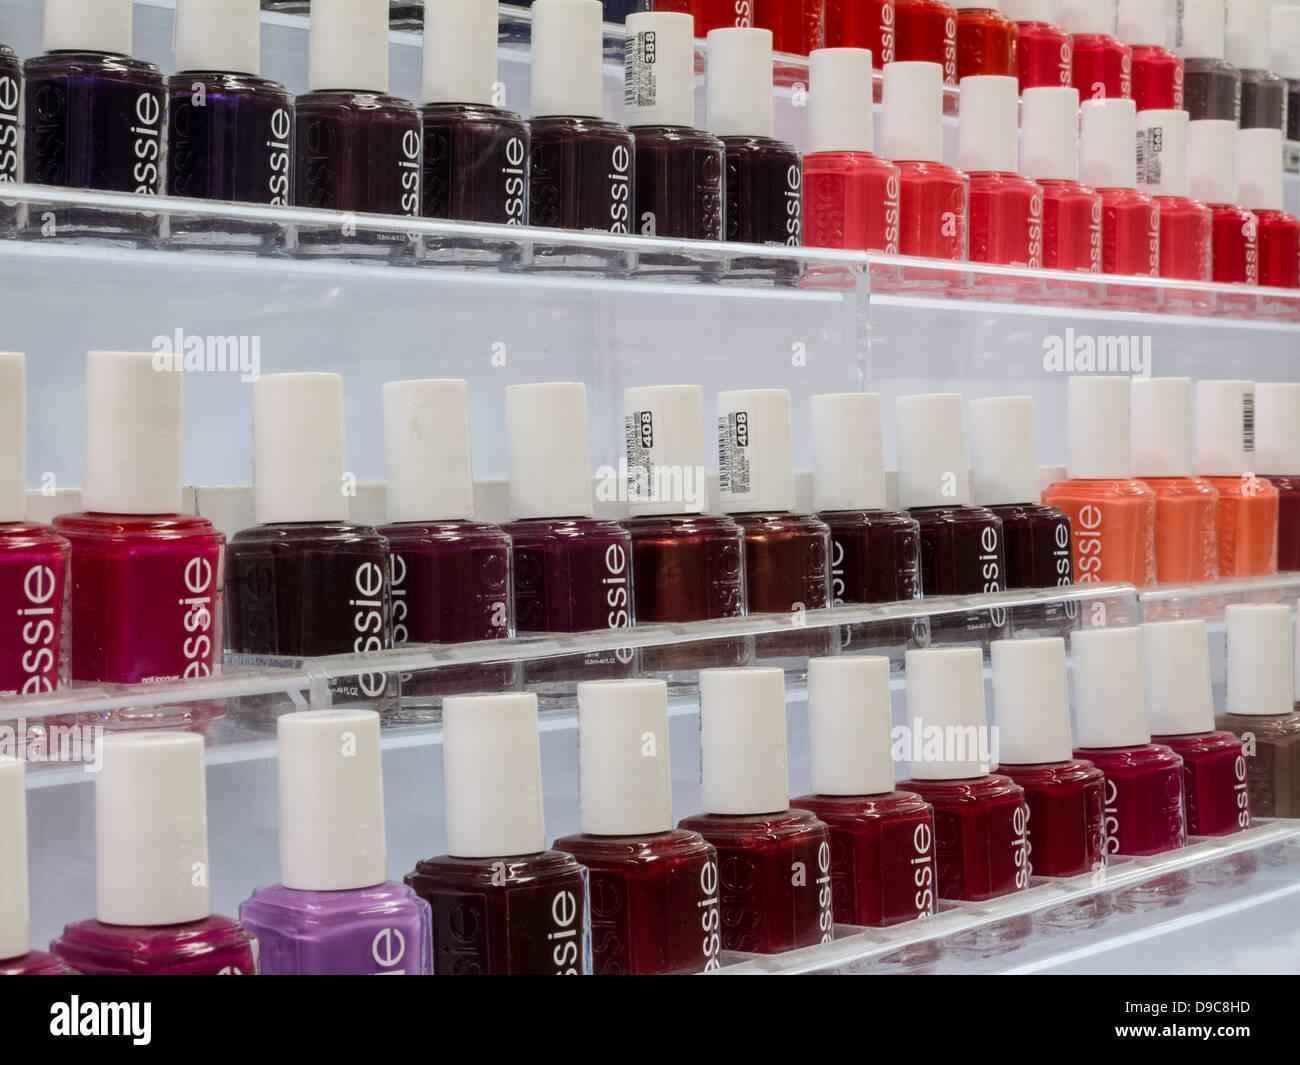 Rows of Essie Brand Nail Polish Bottles, Store Interior, NYC Stock ...